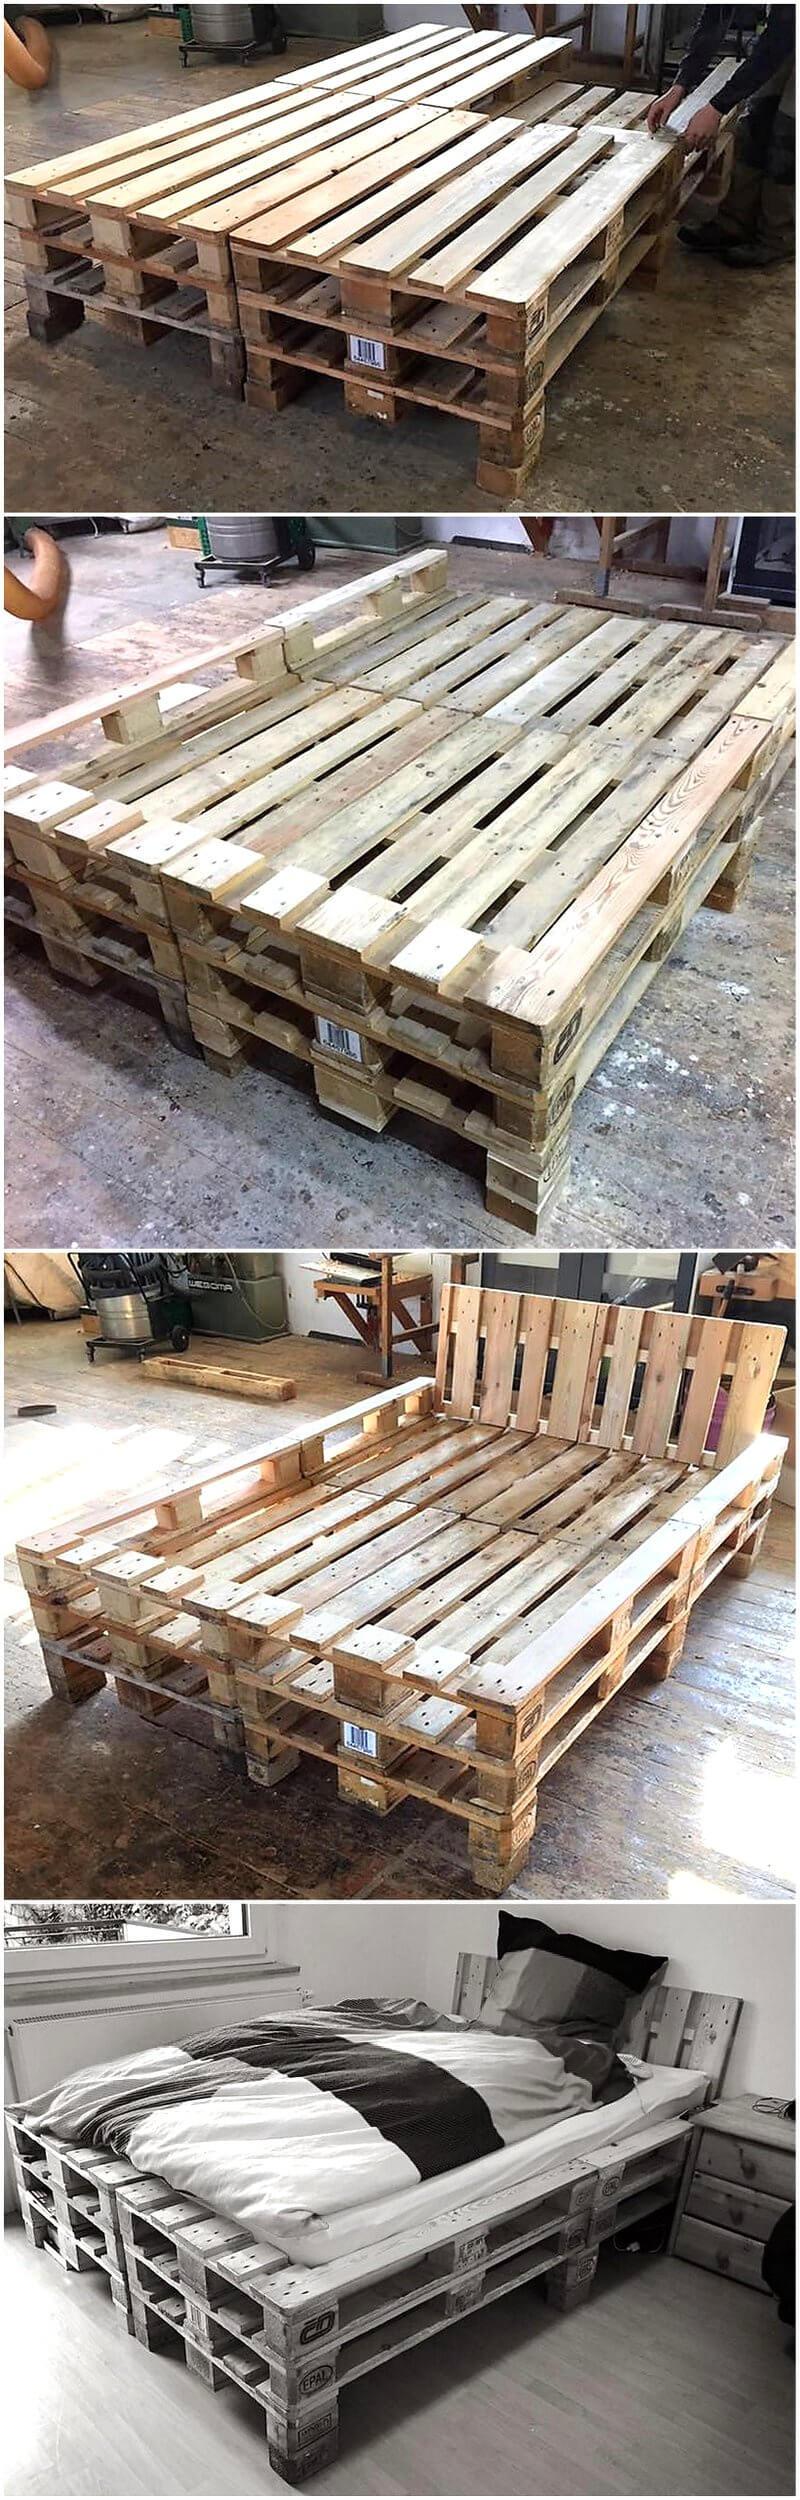 repurposed wood pallets bed